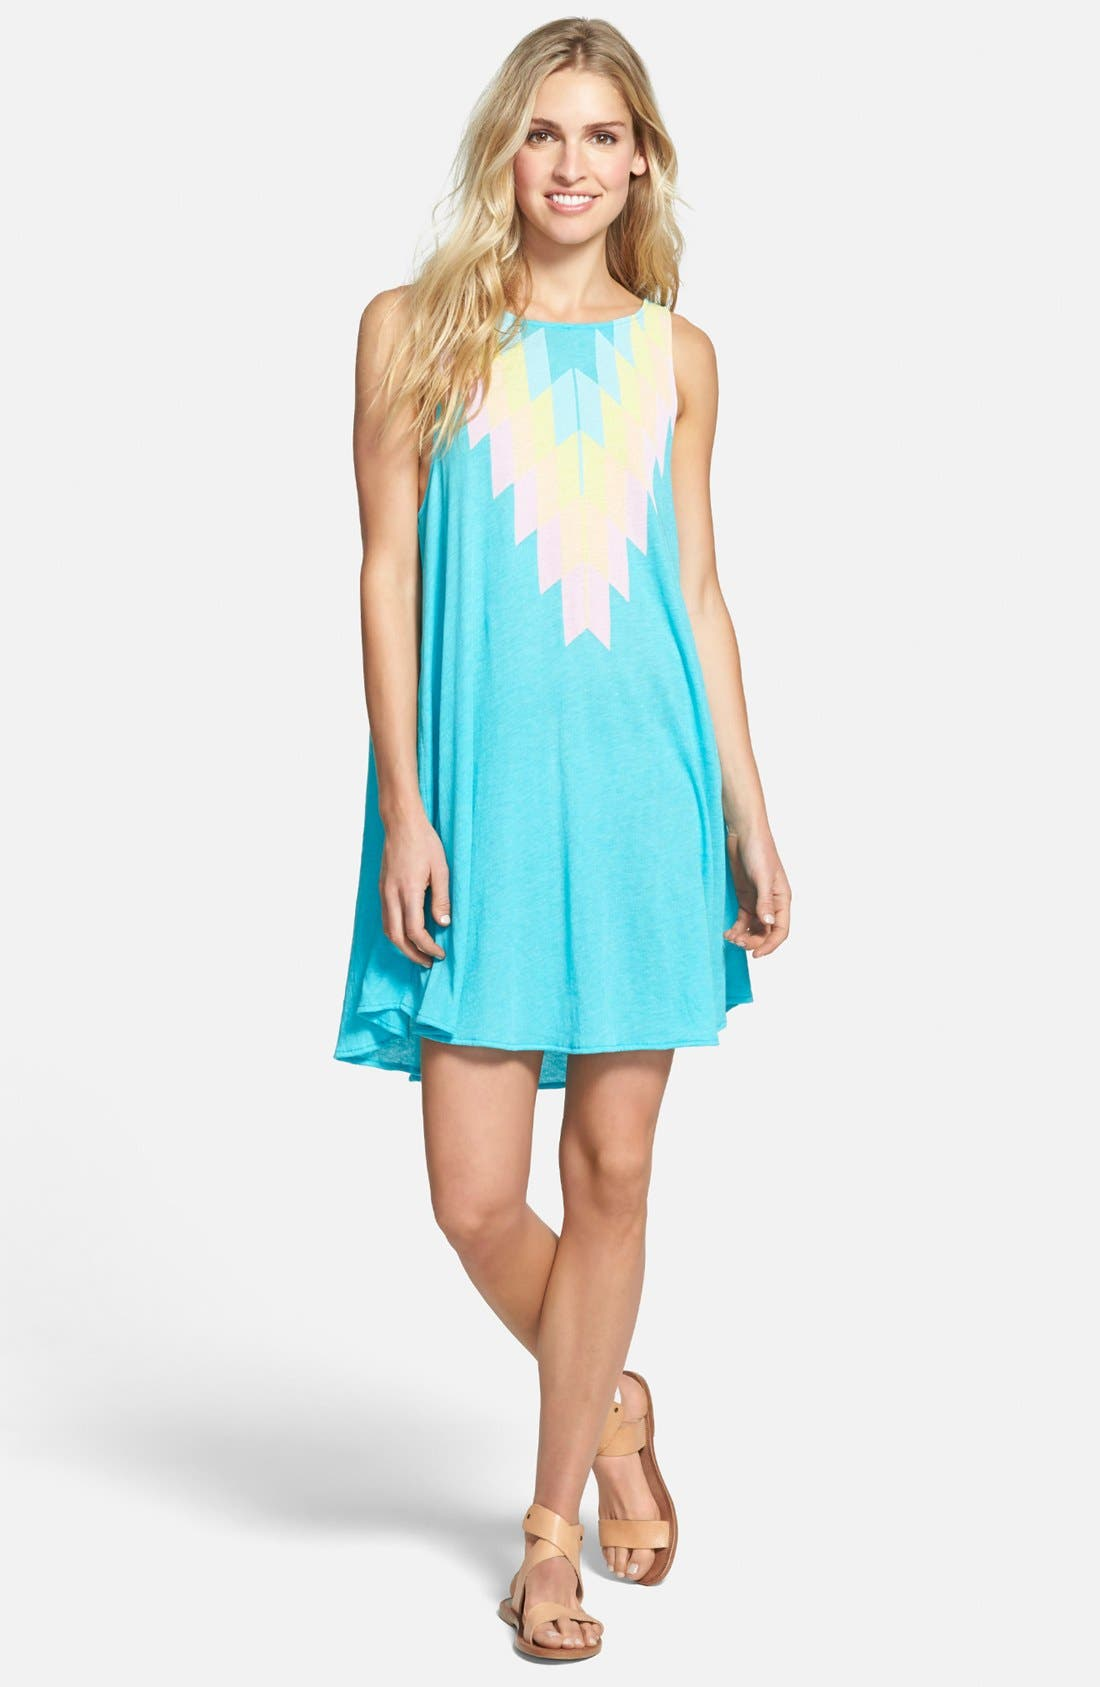 Wildfox 'Cassidy Sea' Sleeveless Tunic Dress